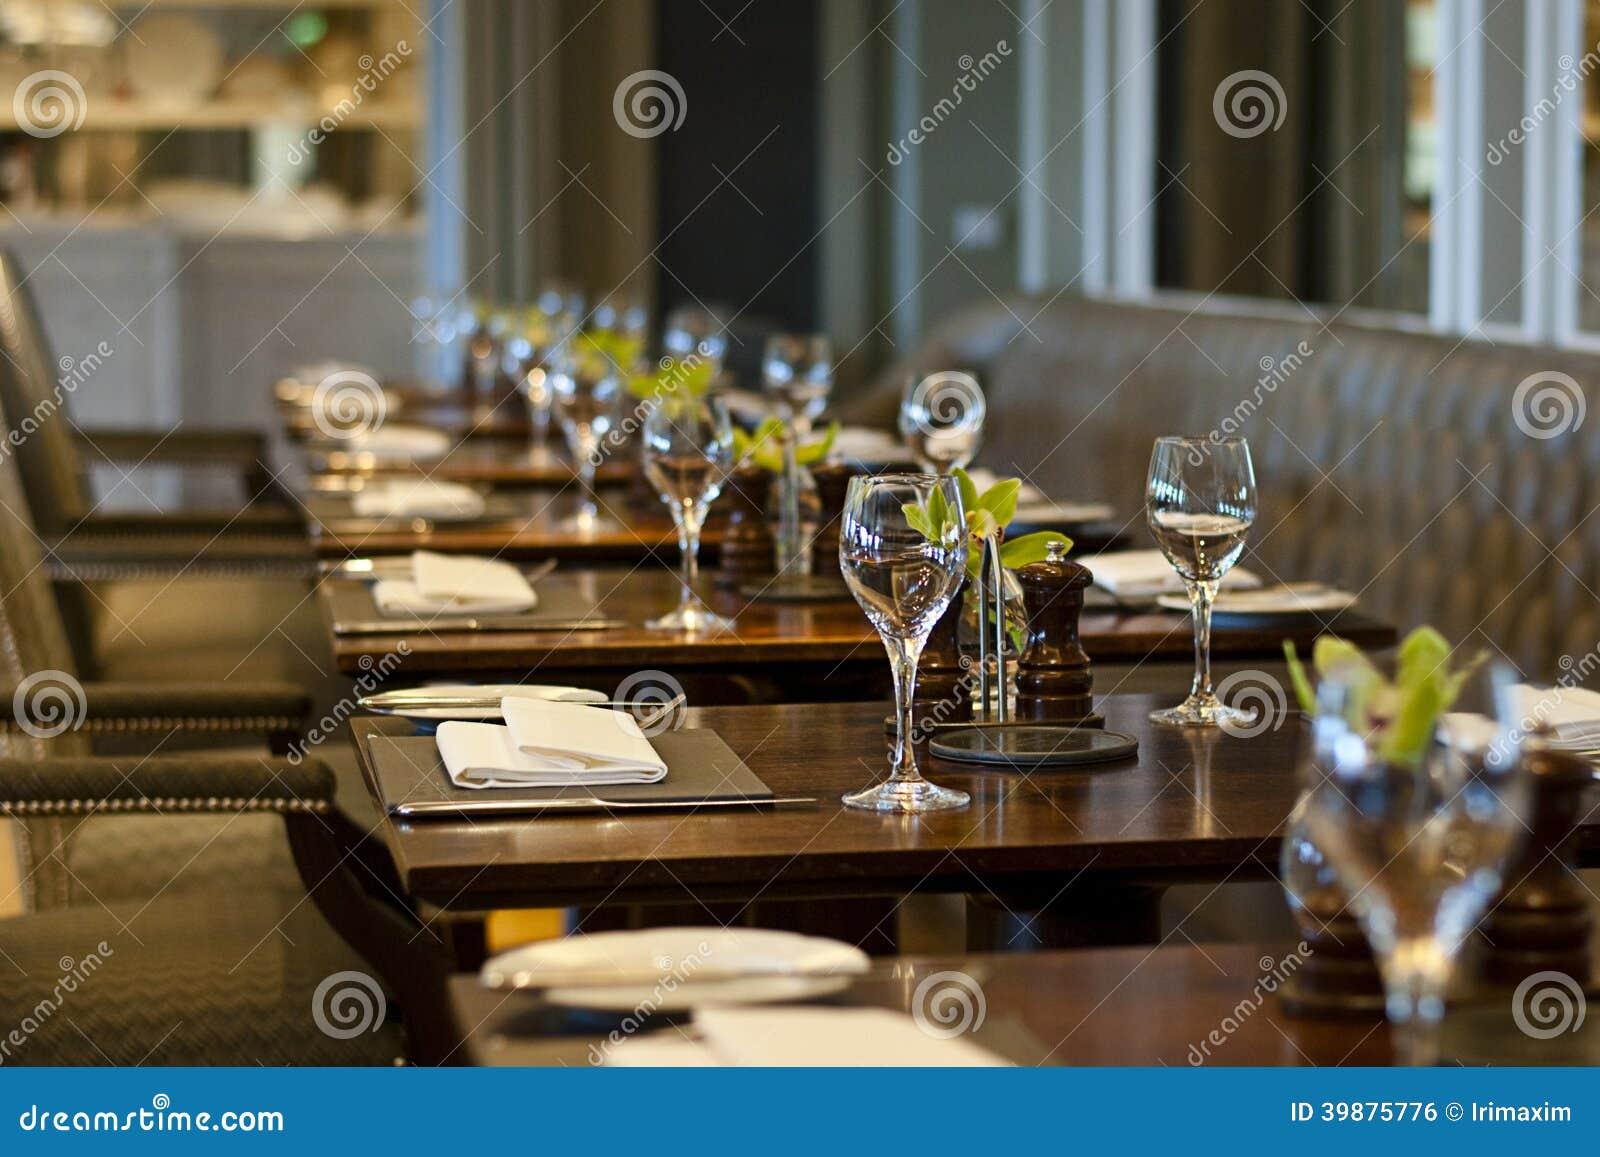 Restaurante acolhedor